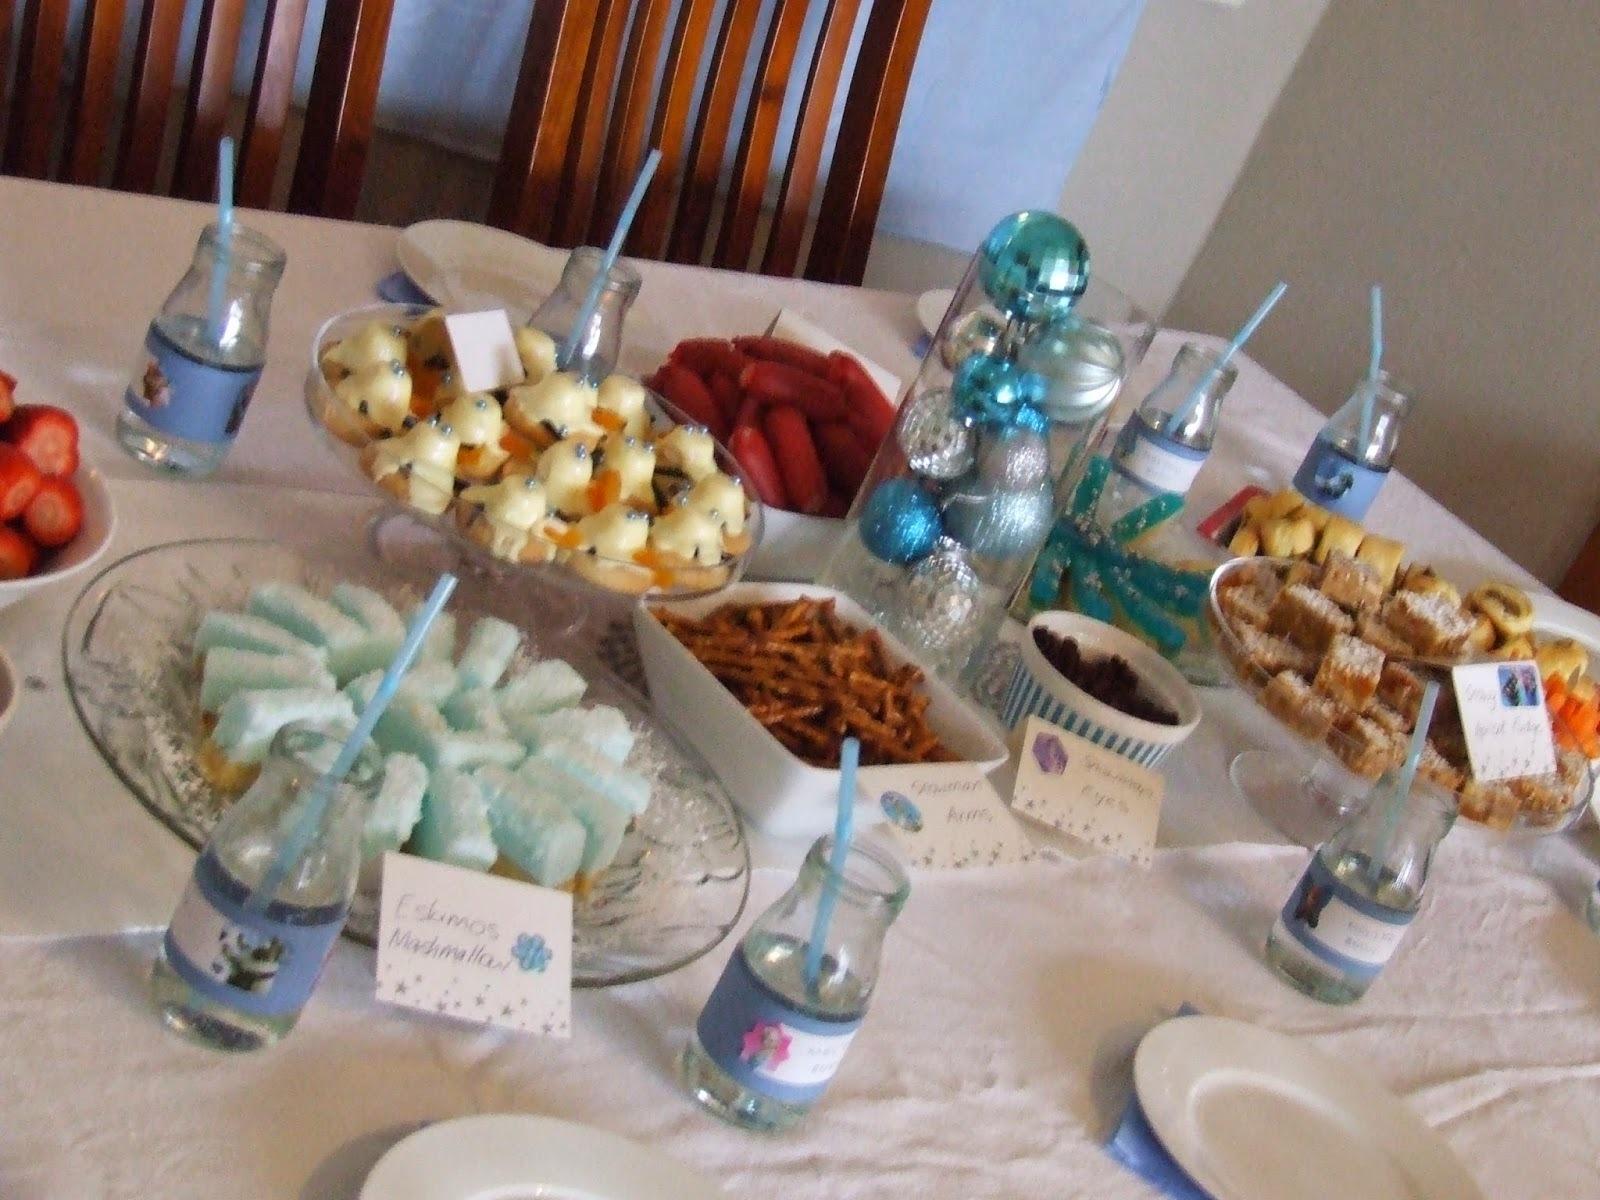 Princess Elsa's Coronation Frozen Party Menu - from Kiwicakes test kitchen